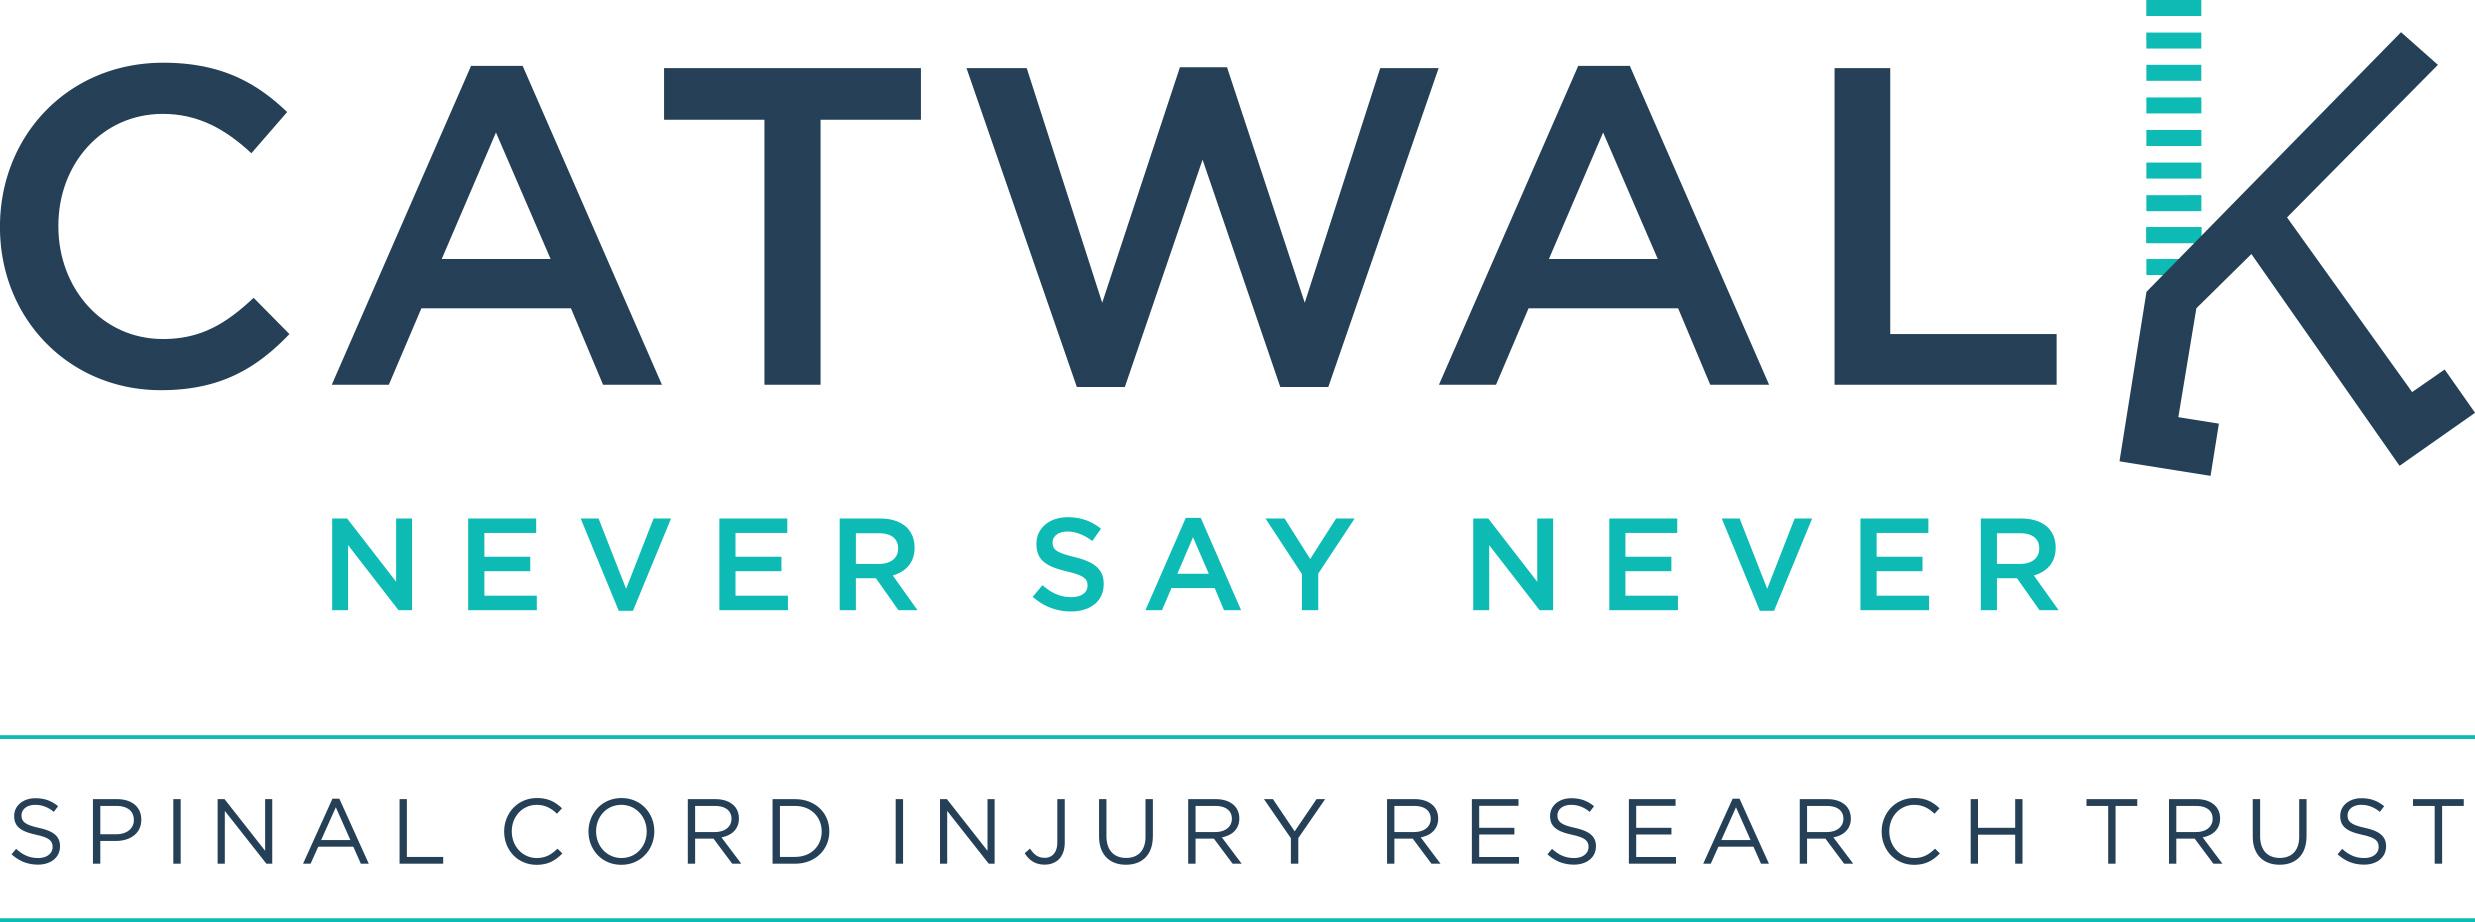 Catwalk Trust Final Logo.jpg